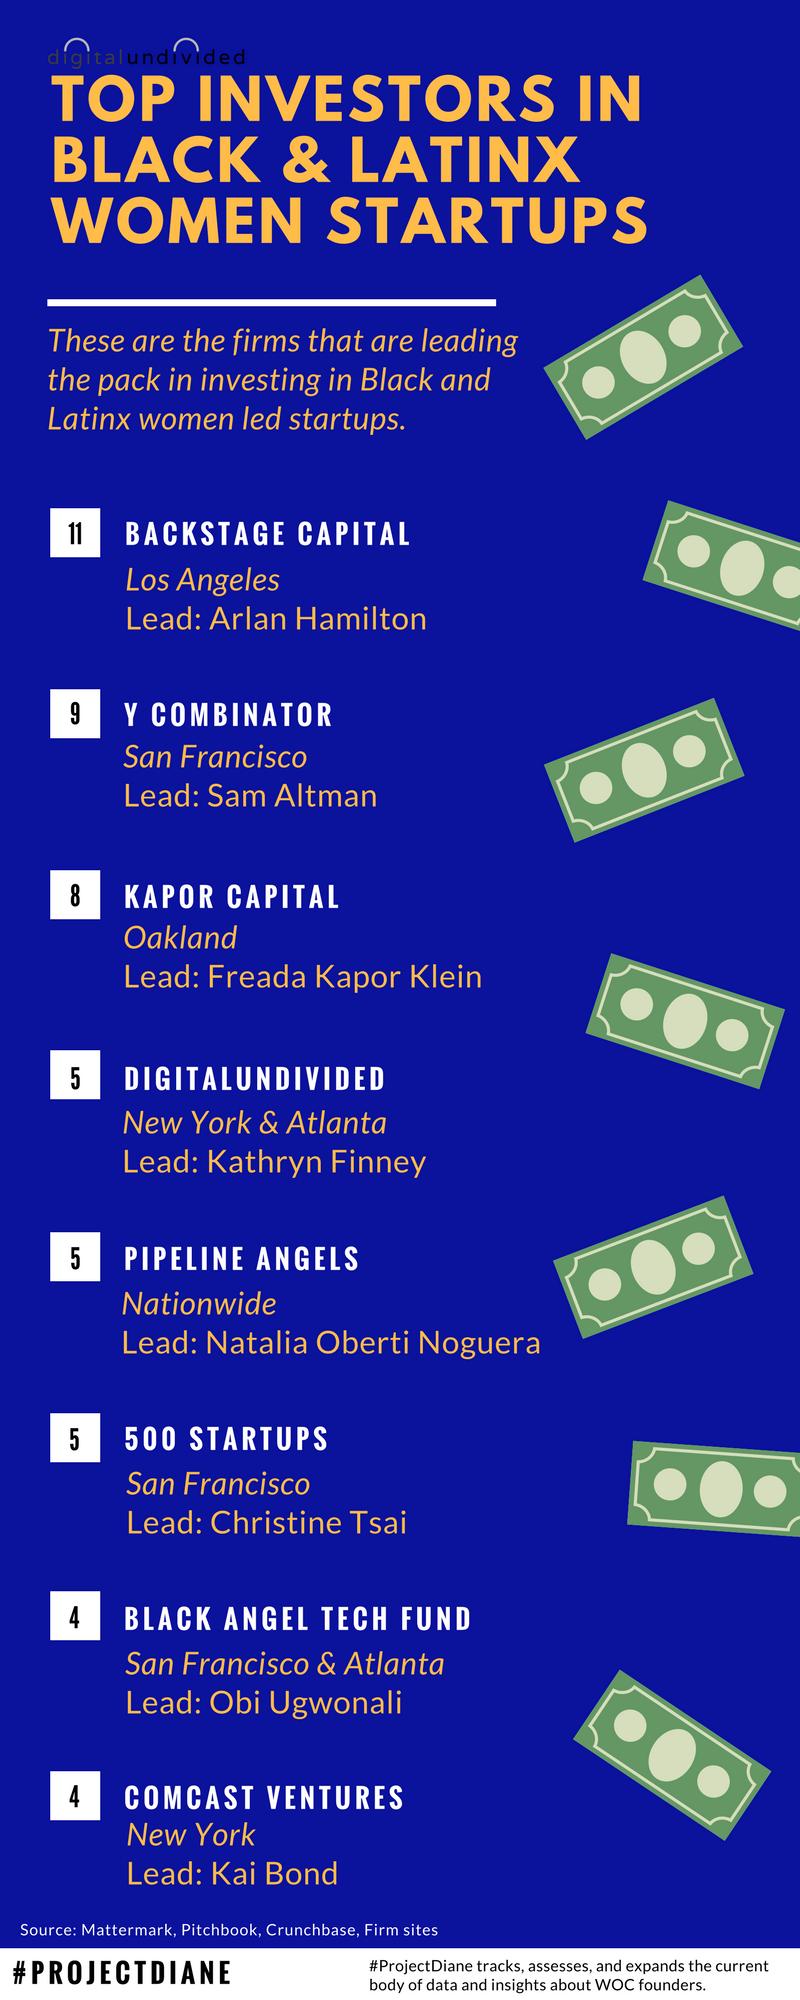 "<p style=""line-height:100%"";>&nbsp;</p><p style=""line-height:120%"";>Top Investors in Black and Latinx Women-led Startups</p>"